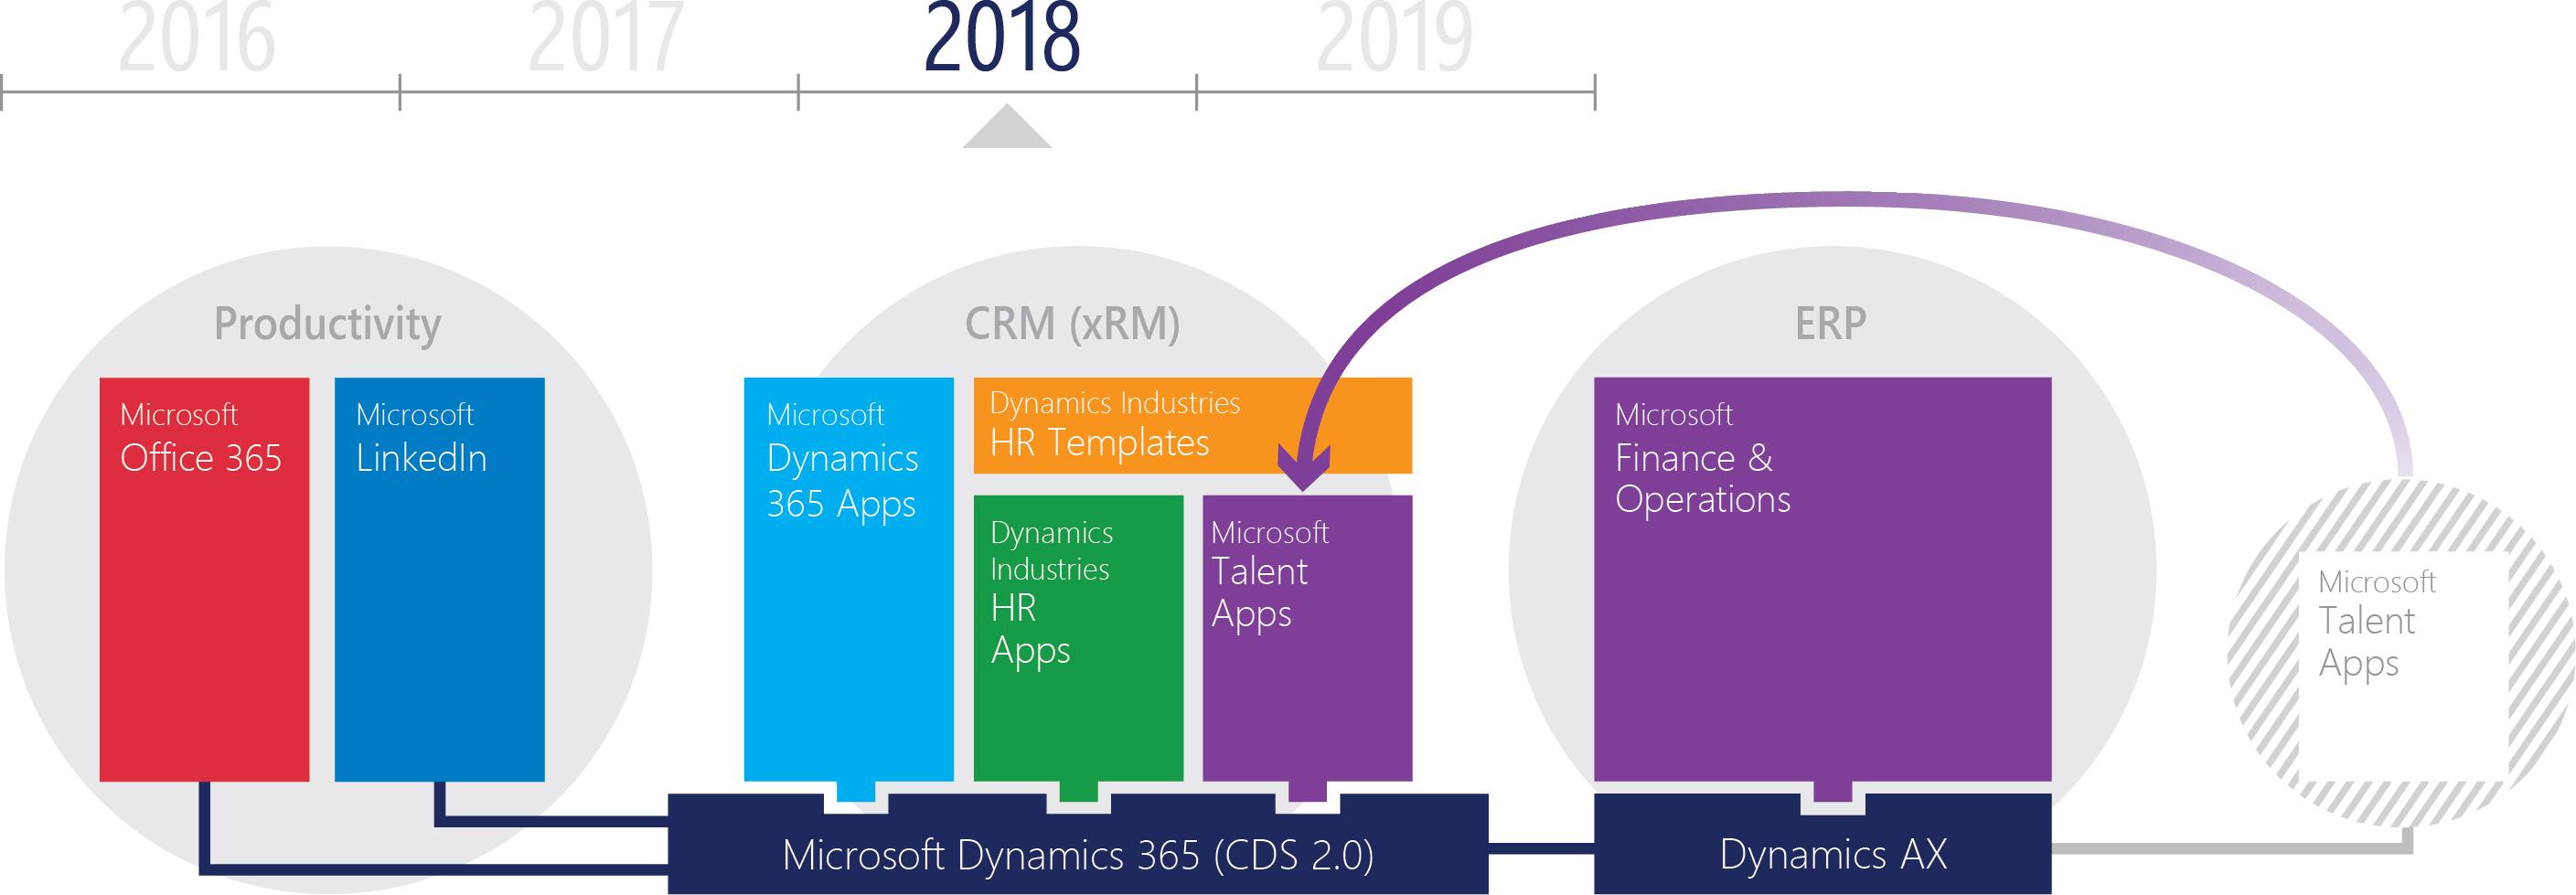 The platform for Microsoft HR is Microsoft Dynamics 365